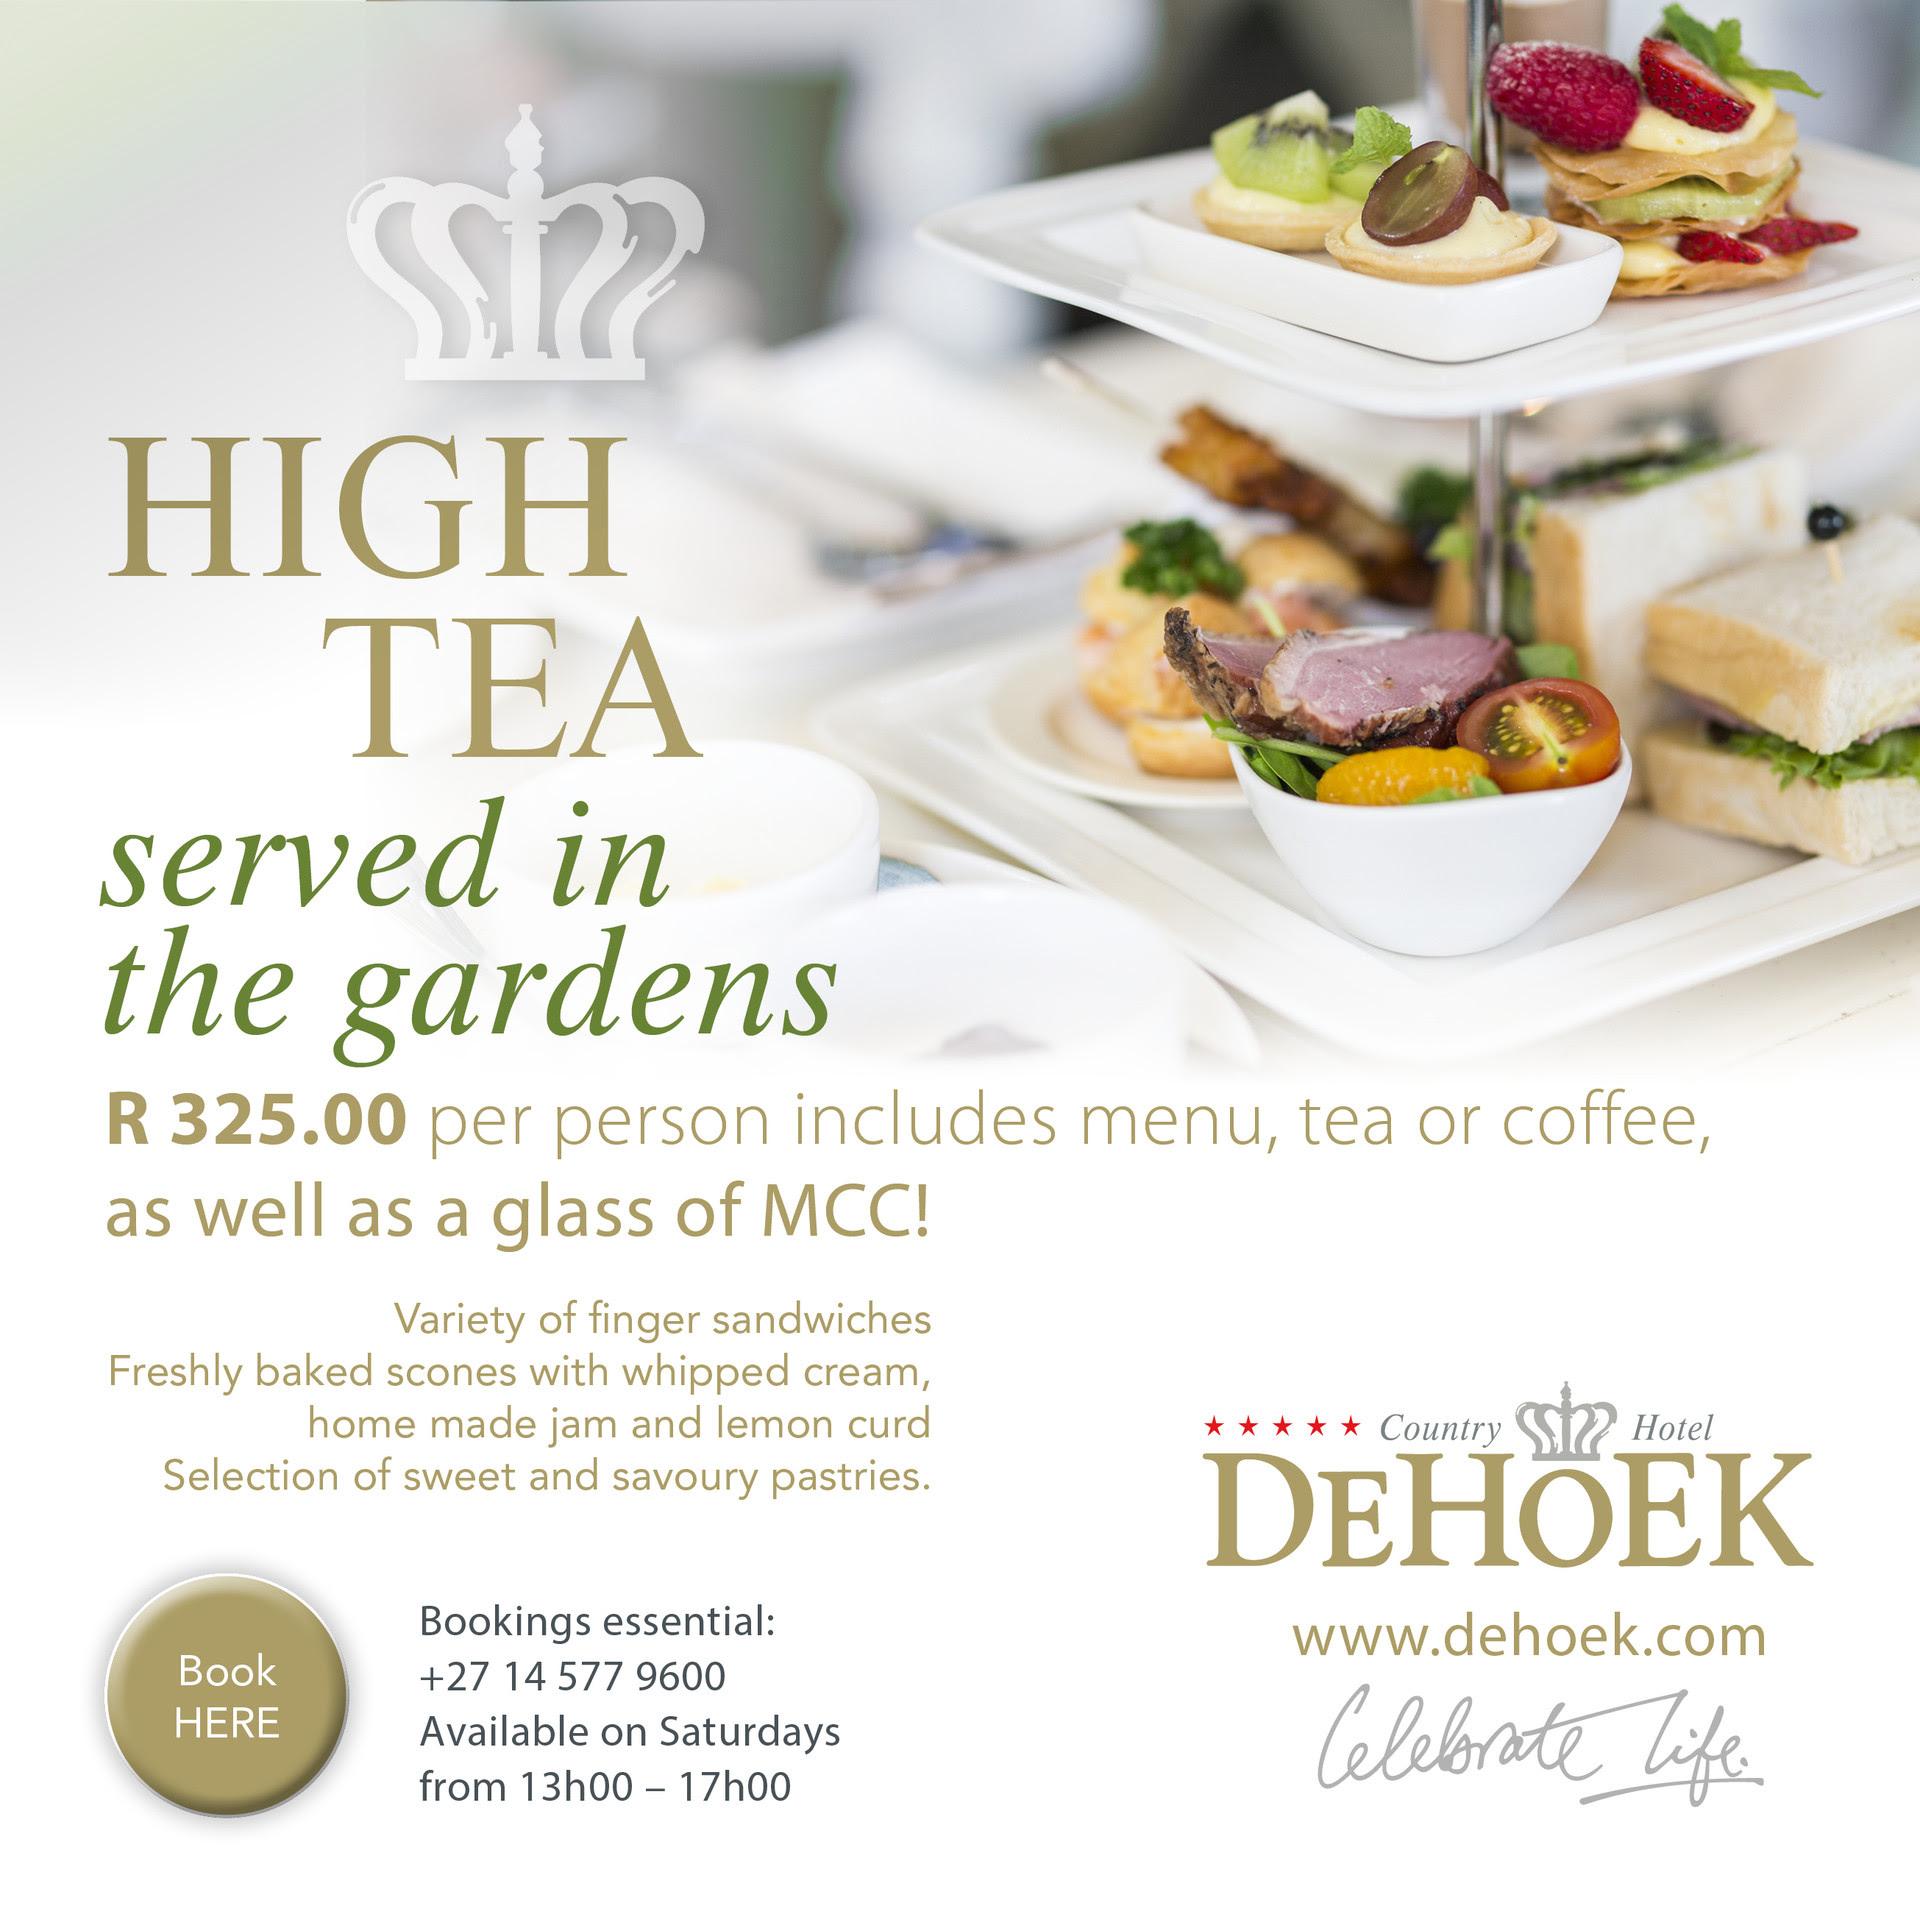 High_Tea_in_the_Gardens.jpg